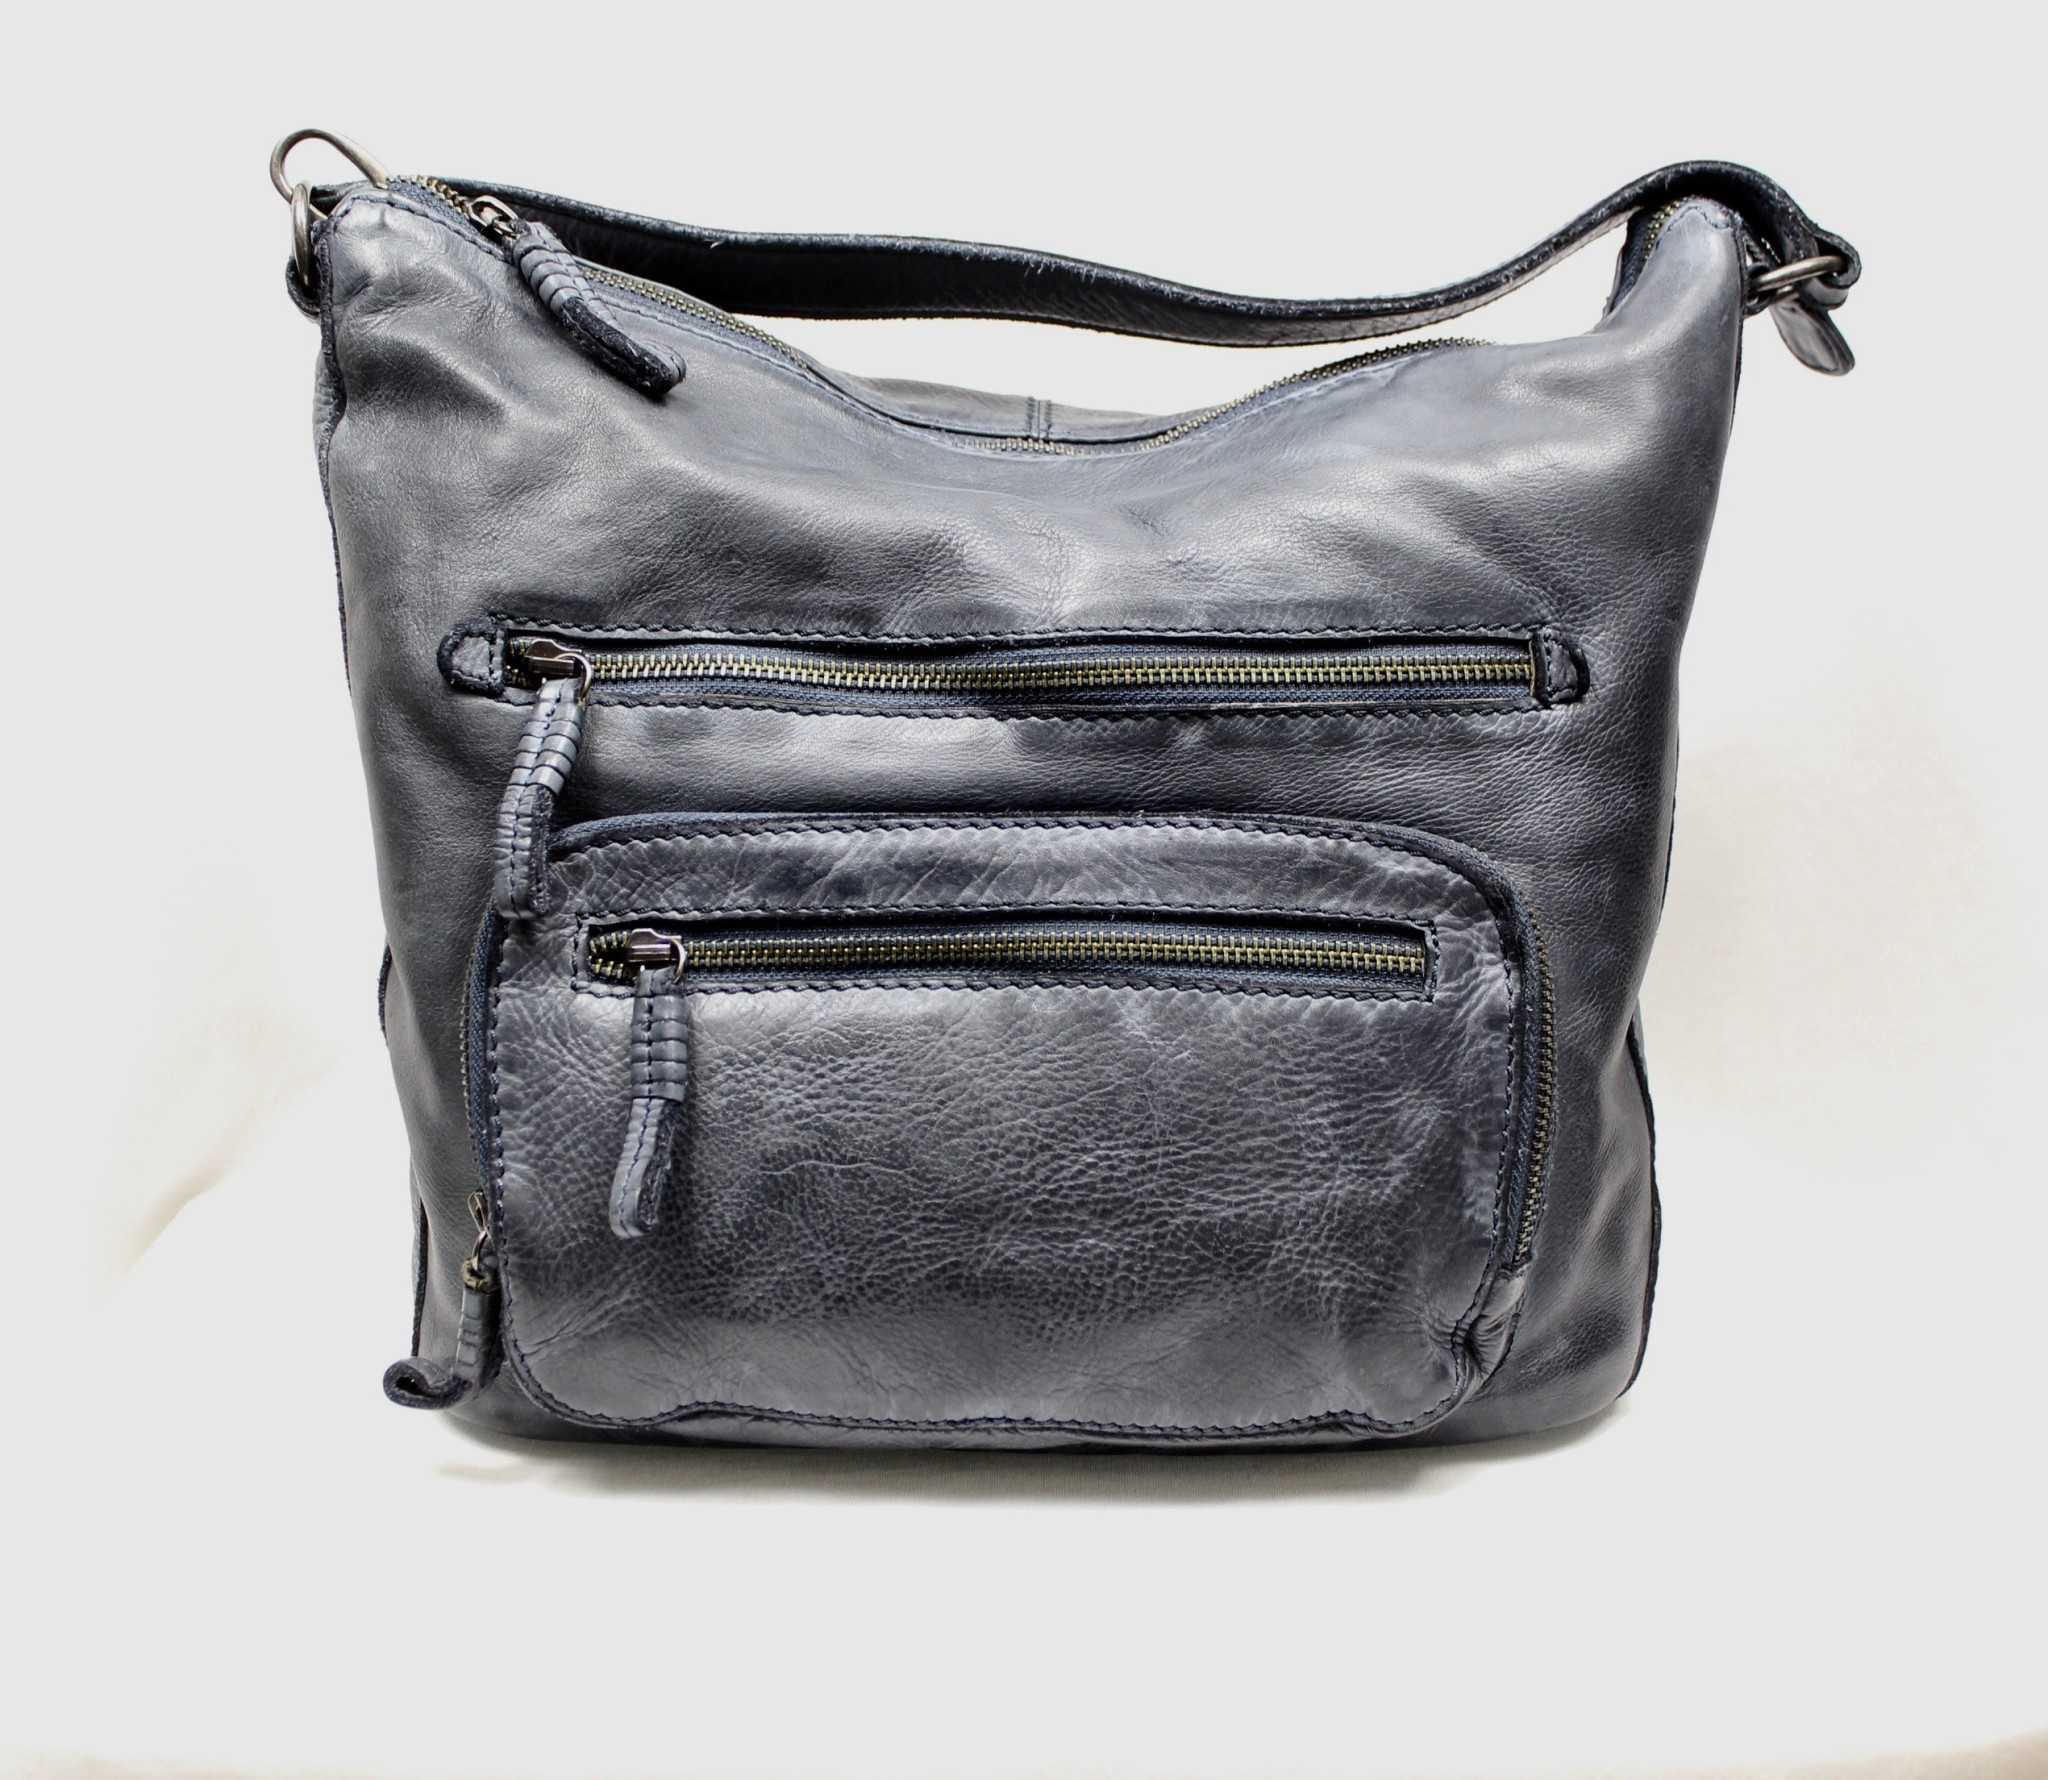 THE TREND THE TREND 26850 Hobo Handbag